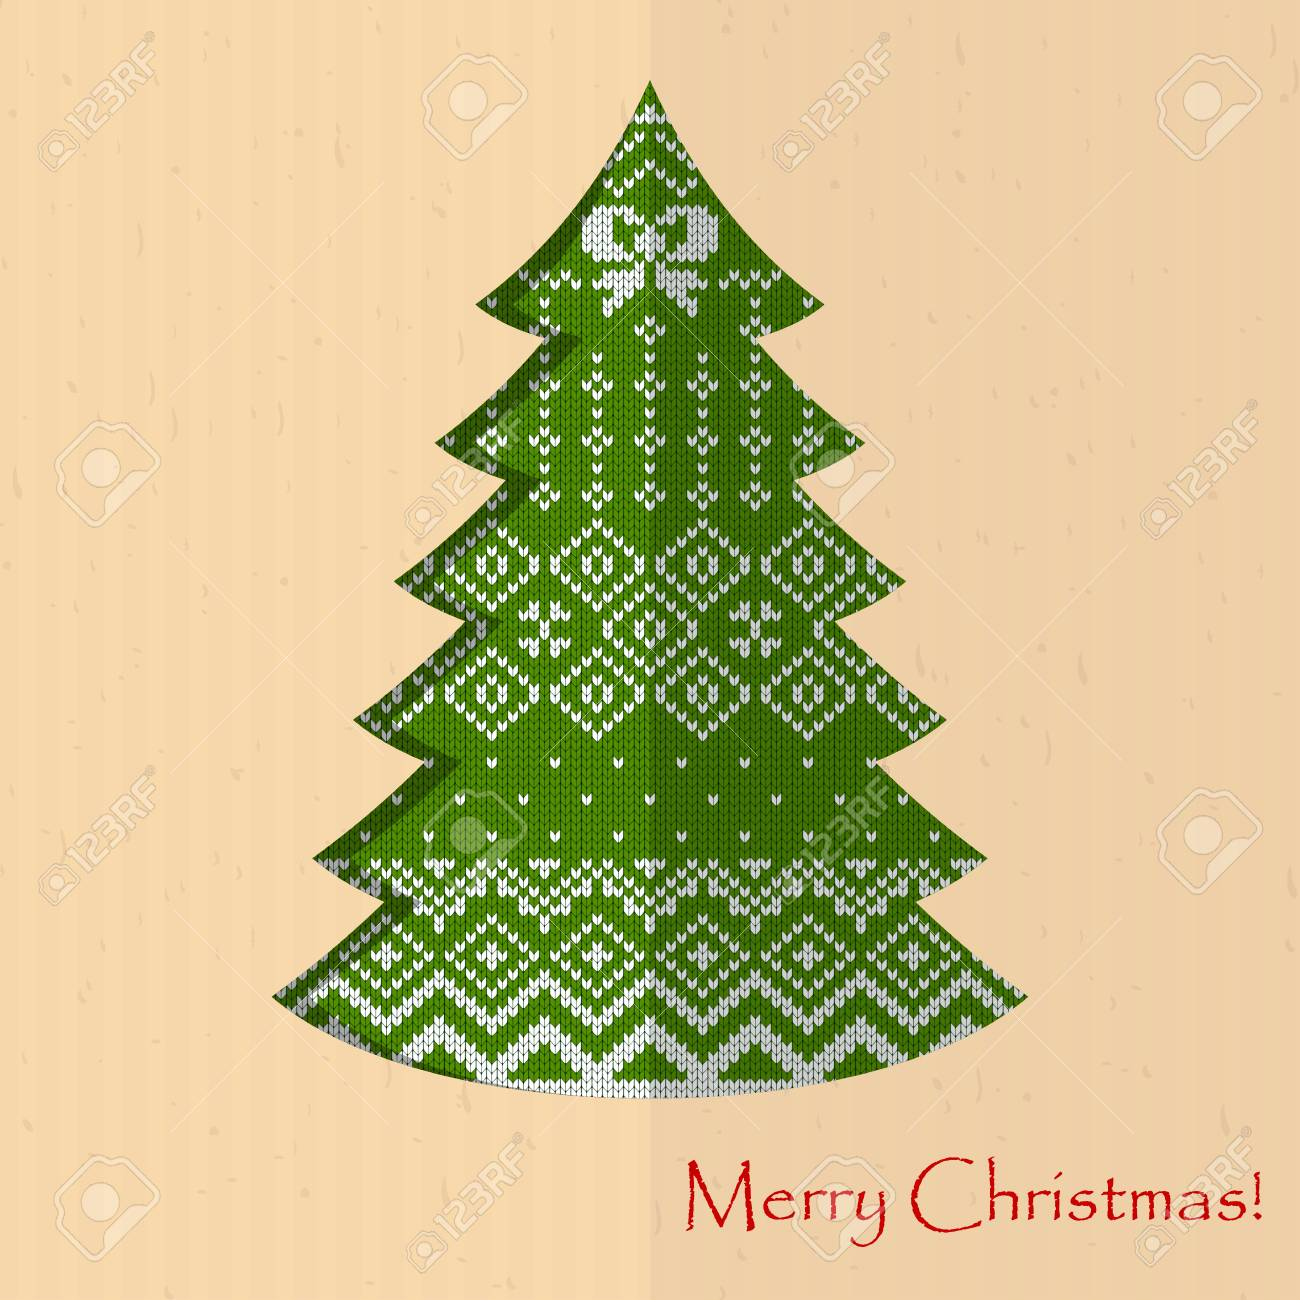 Bastelpapier Weihnachten.Handmade Postcard To New Year And Christmas Congratulations